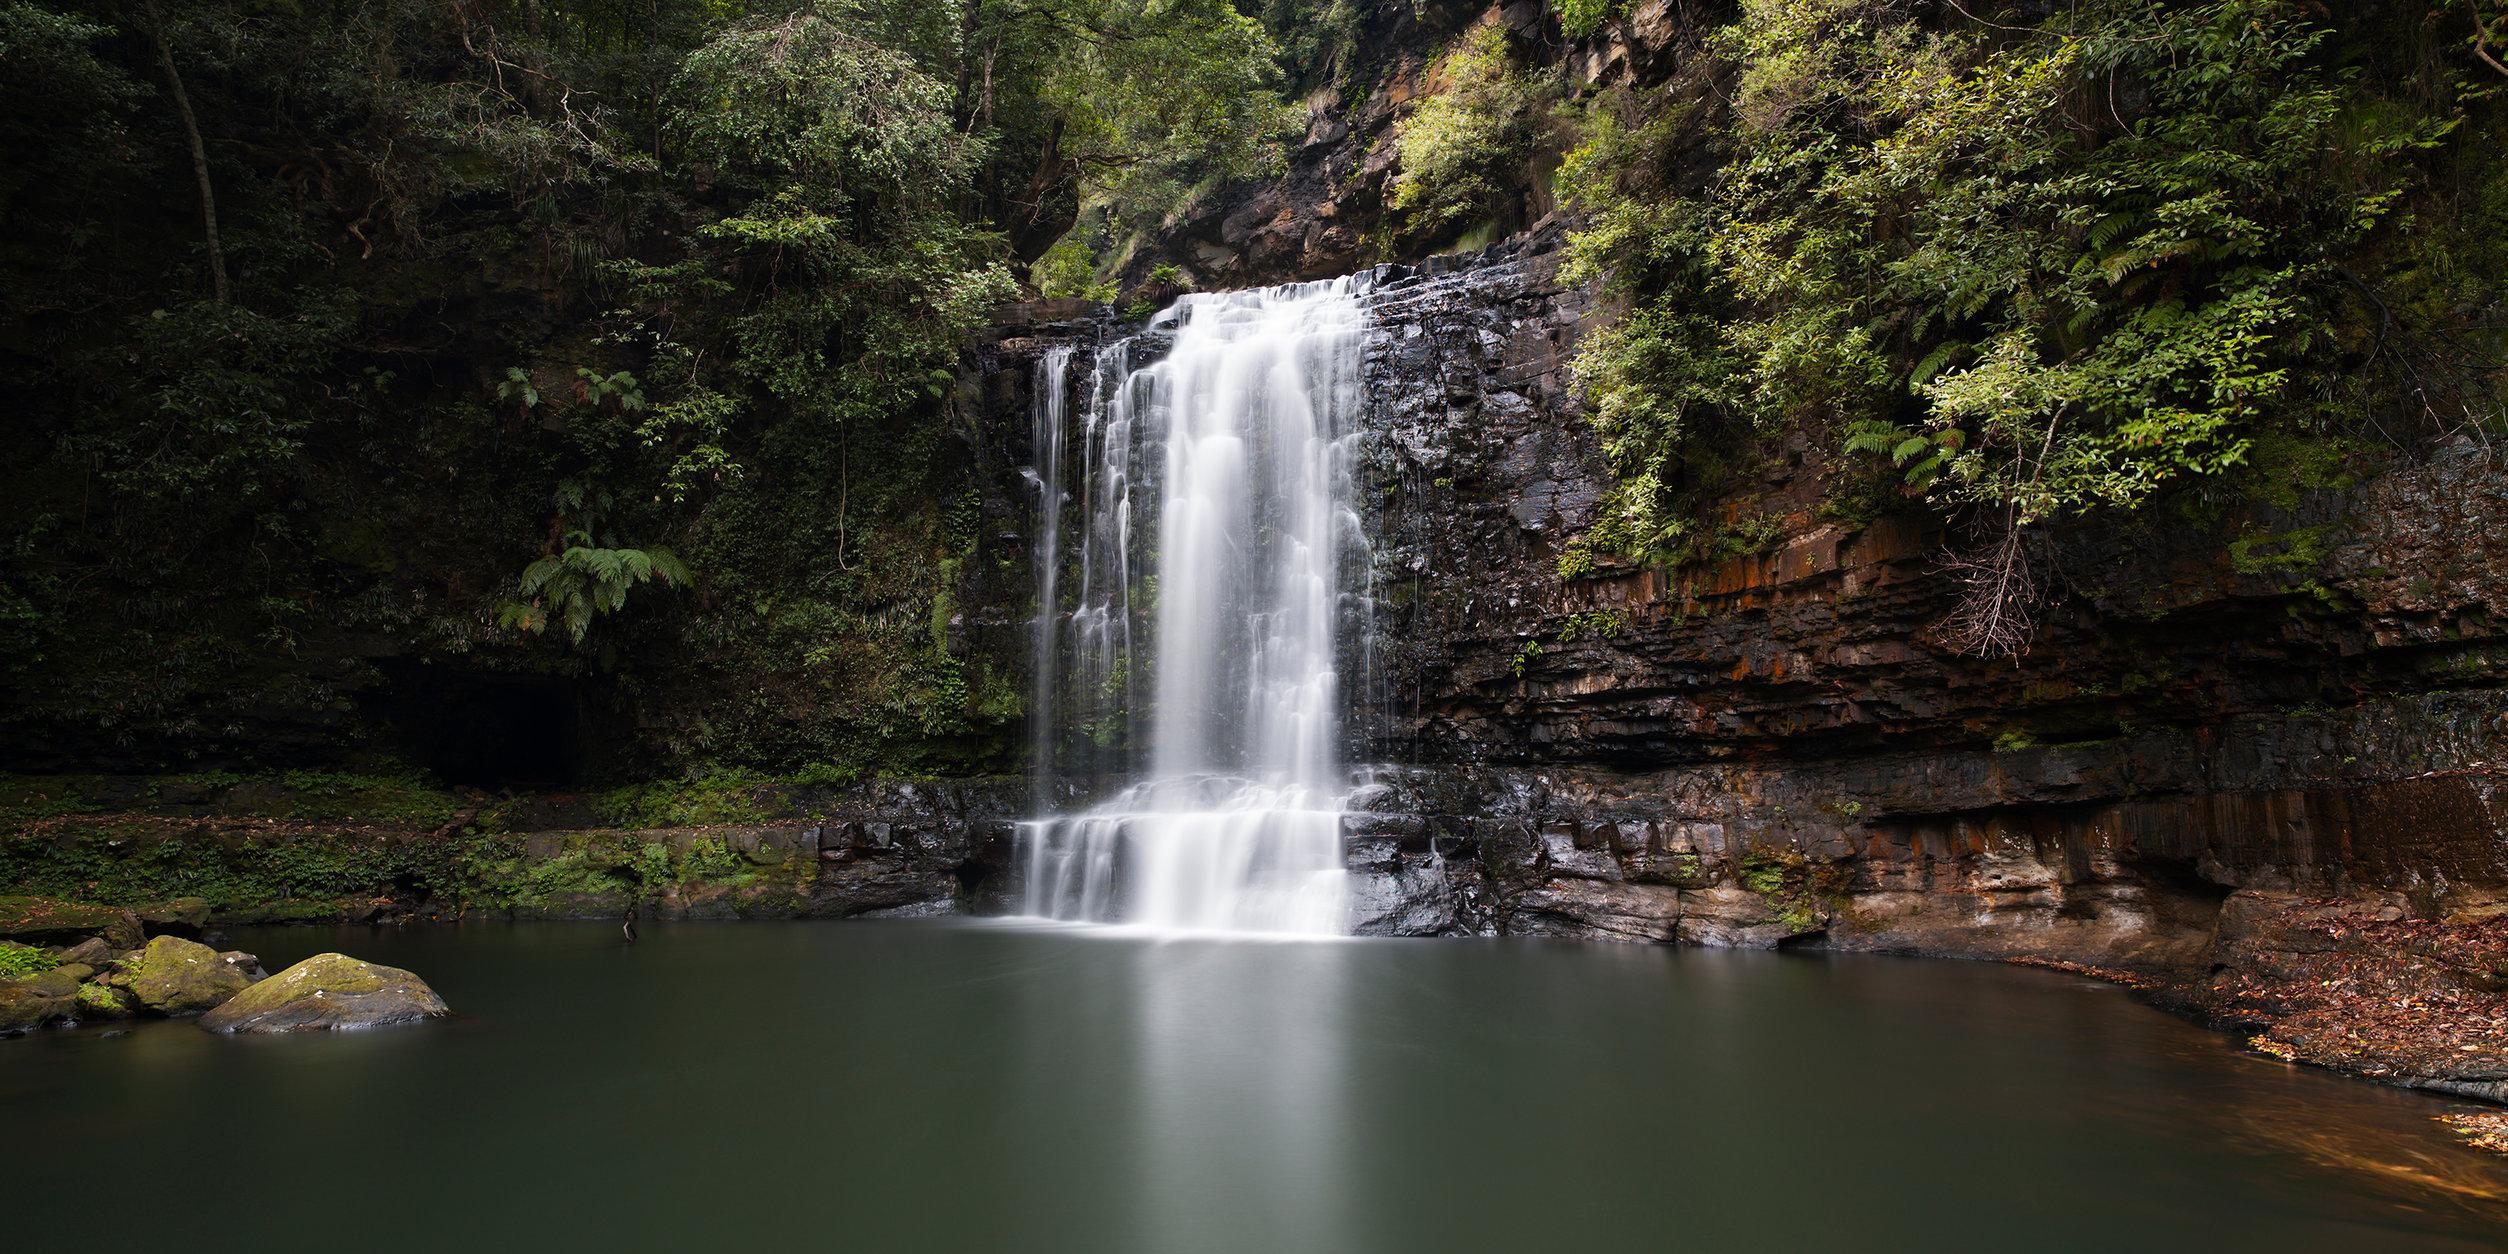 Wild-Swimming-Australia©Swimming-Hole-Belmore_Falls_3rdD_Andy_Lewis_CF084229-Edit_6footMax.jpg